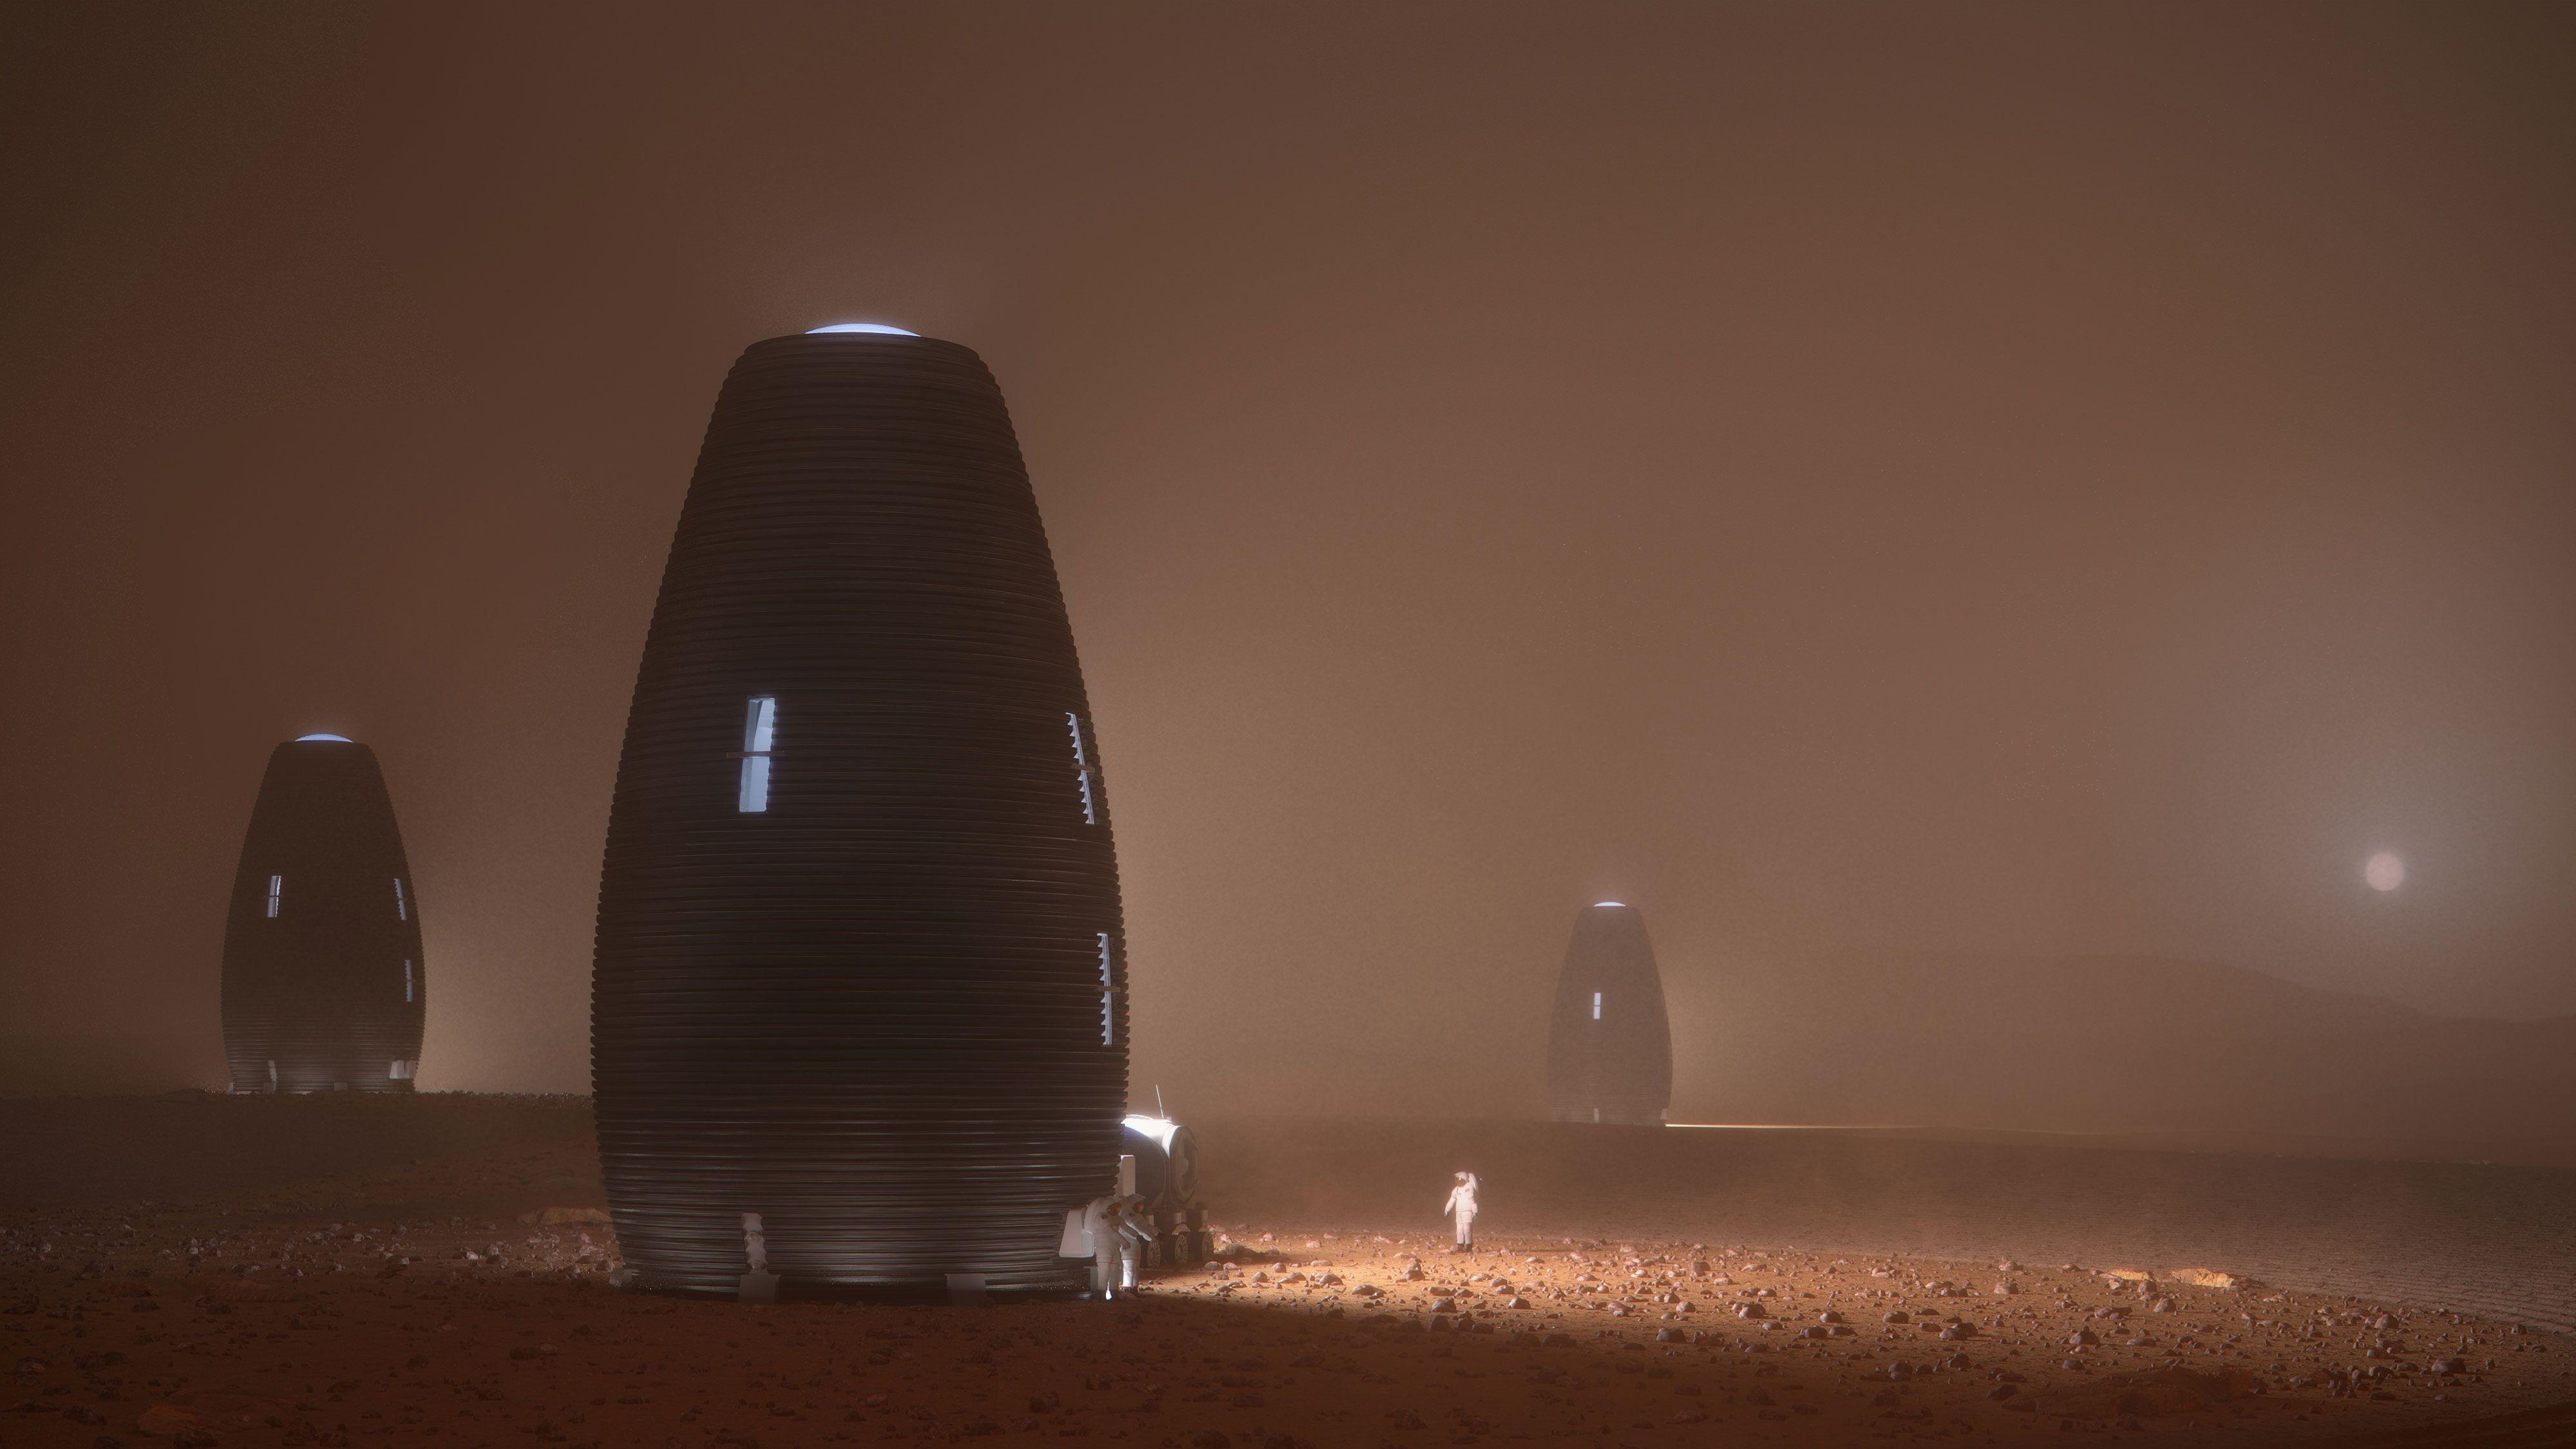 3Dプリント製「火星の家」の住み心地は? NASA主催コンペ決勝へ